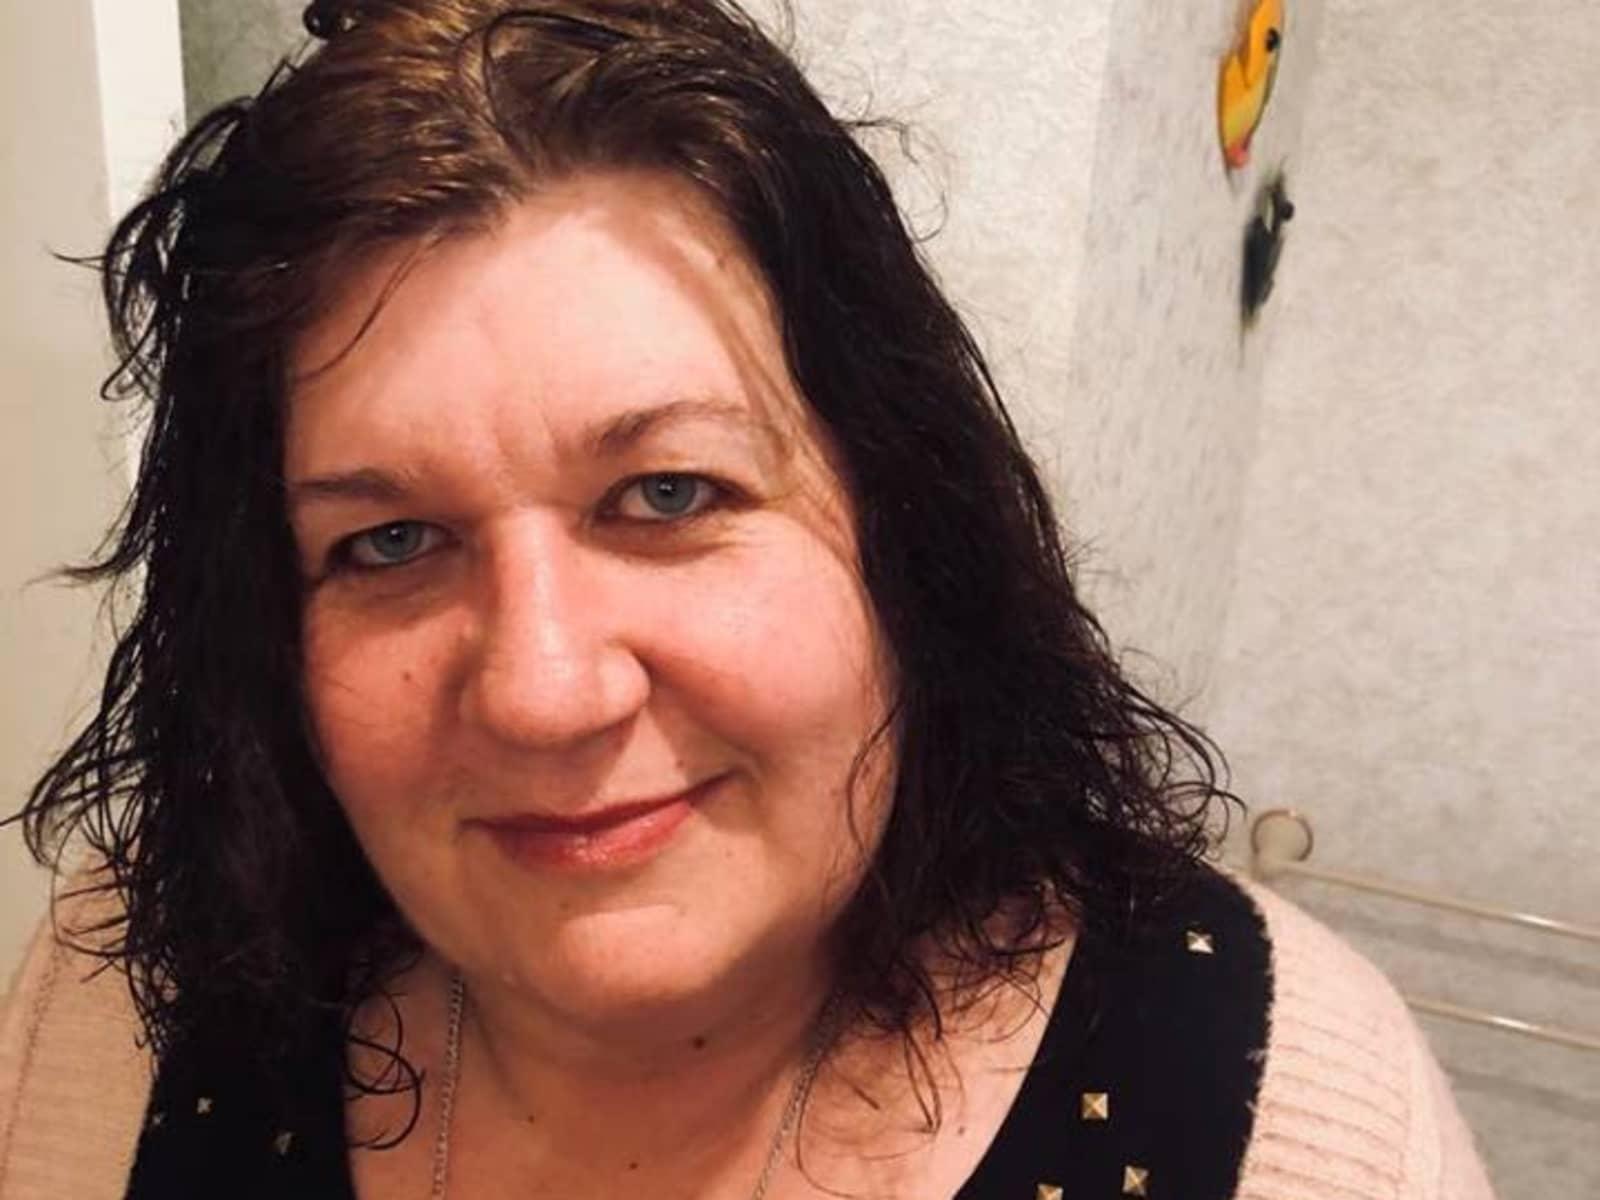 Vivian from Napier, New Zealand